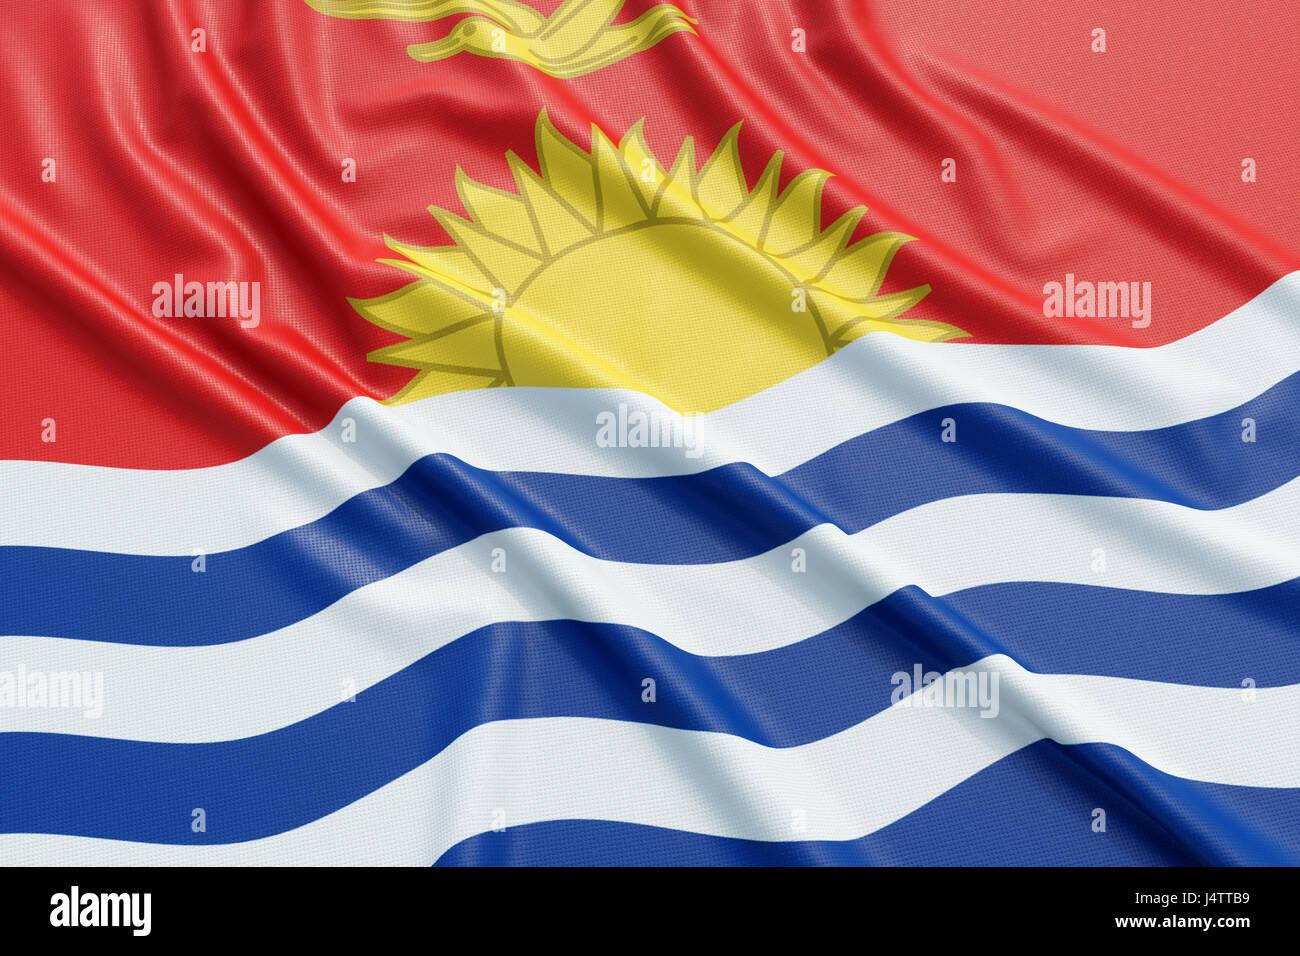 Kiribati flag. Wavy fabric high detailed texture. 3d illustration rendering - Stock Image